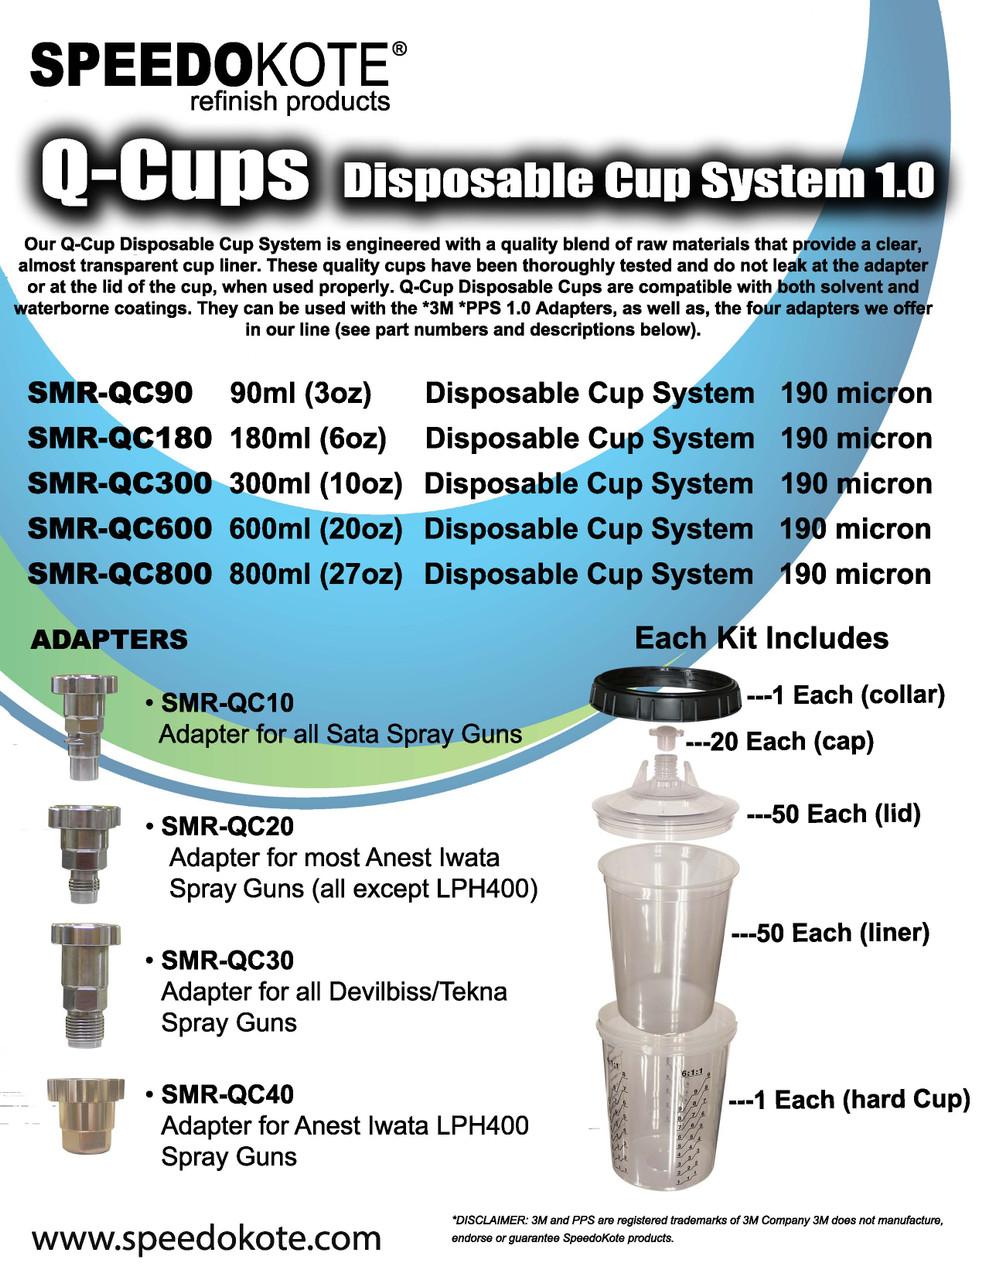 Q-Cup Spray Gun Cup Adapter SMR-QC30 - Fits all Devilbiss/Tekna Spray Guns